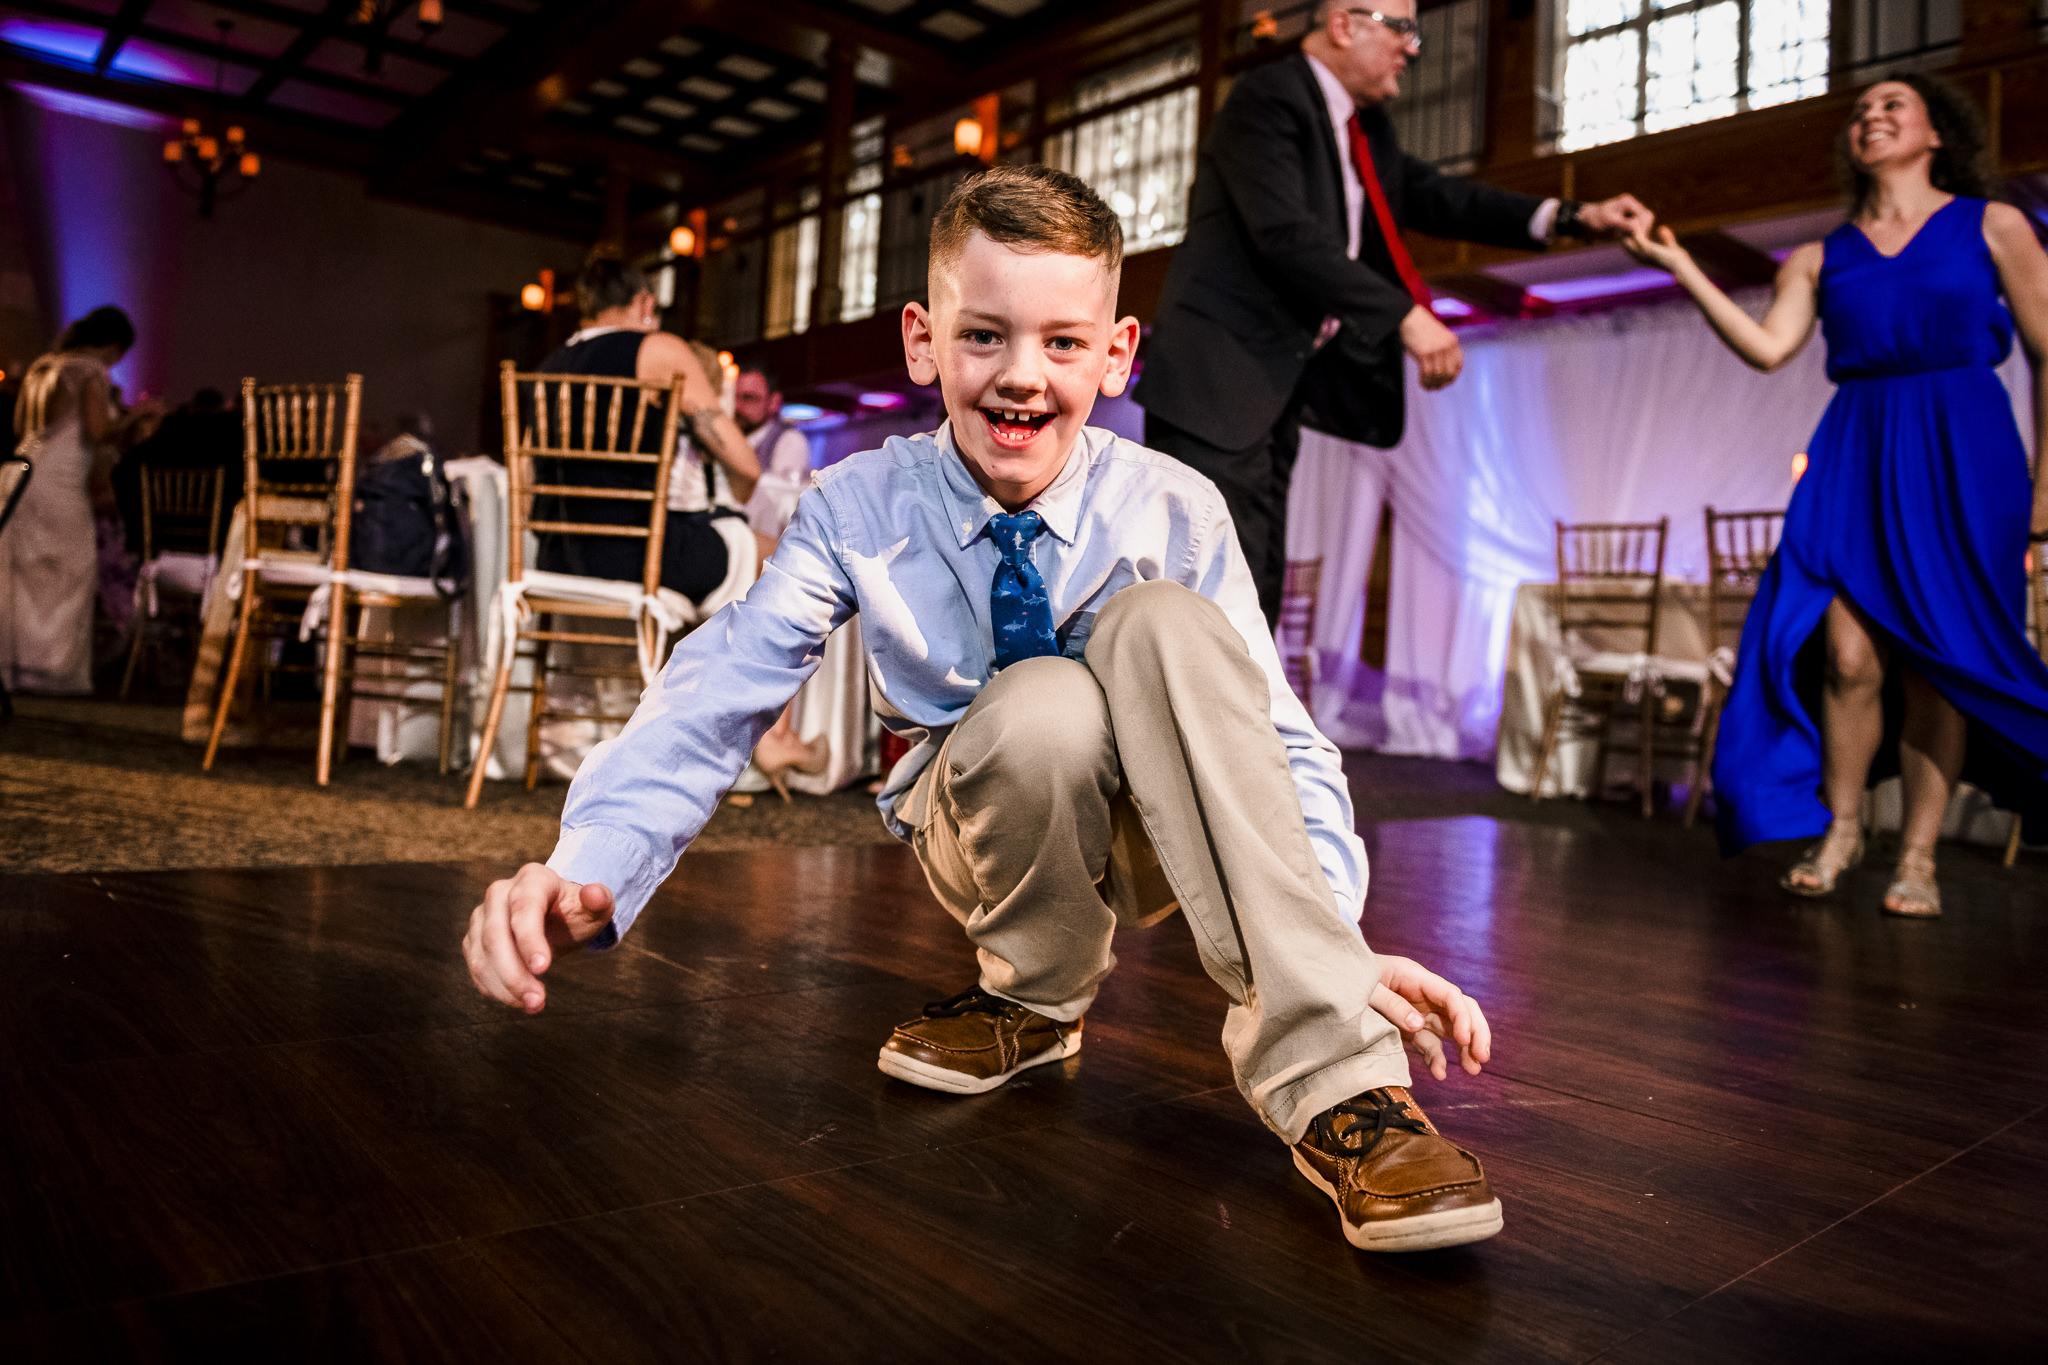 Barbato-Moorestown-Community-House-Wedding-New-Jersey-Photographer-34.JPG